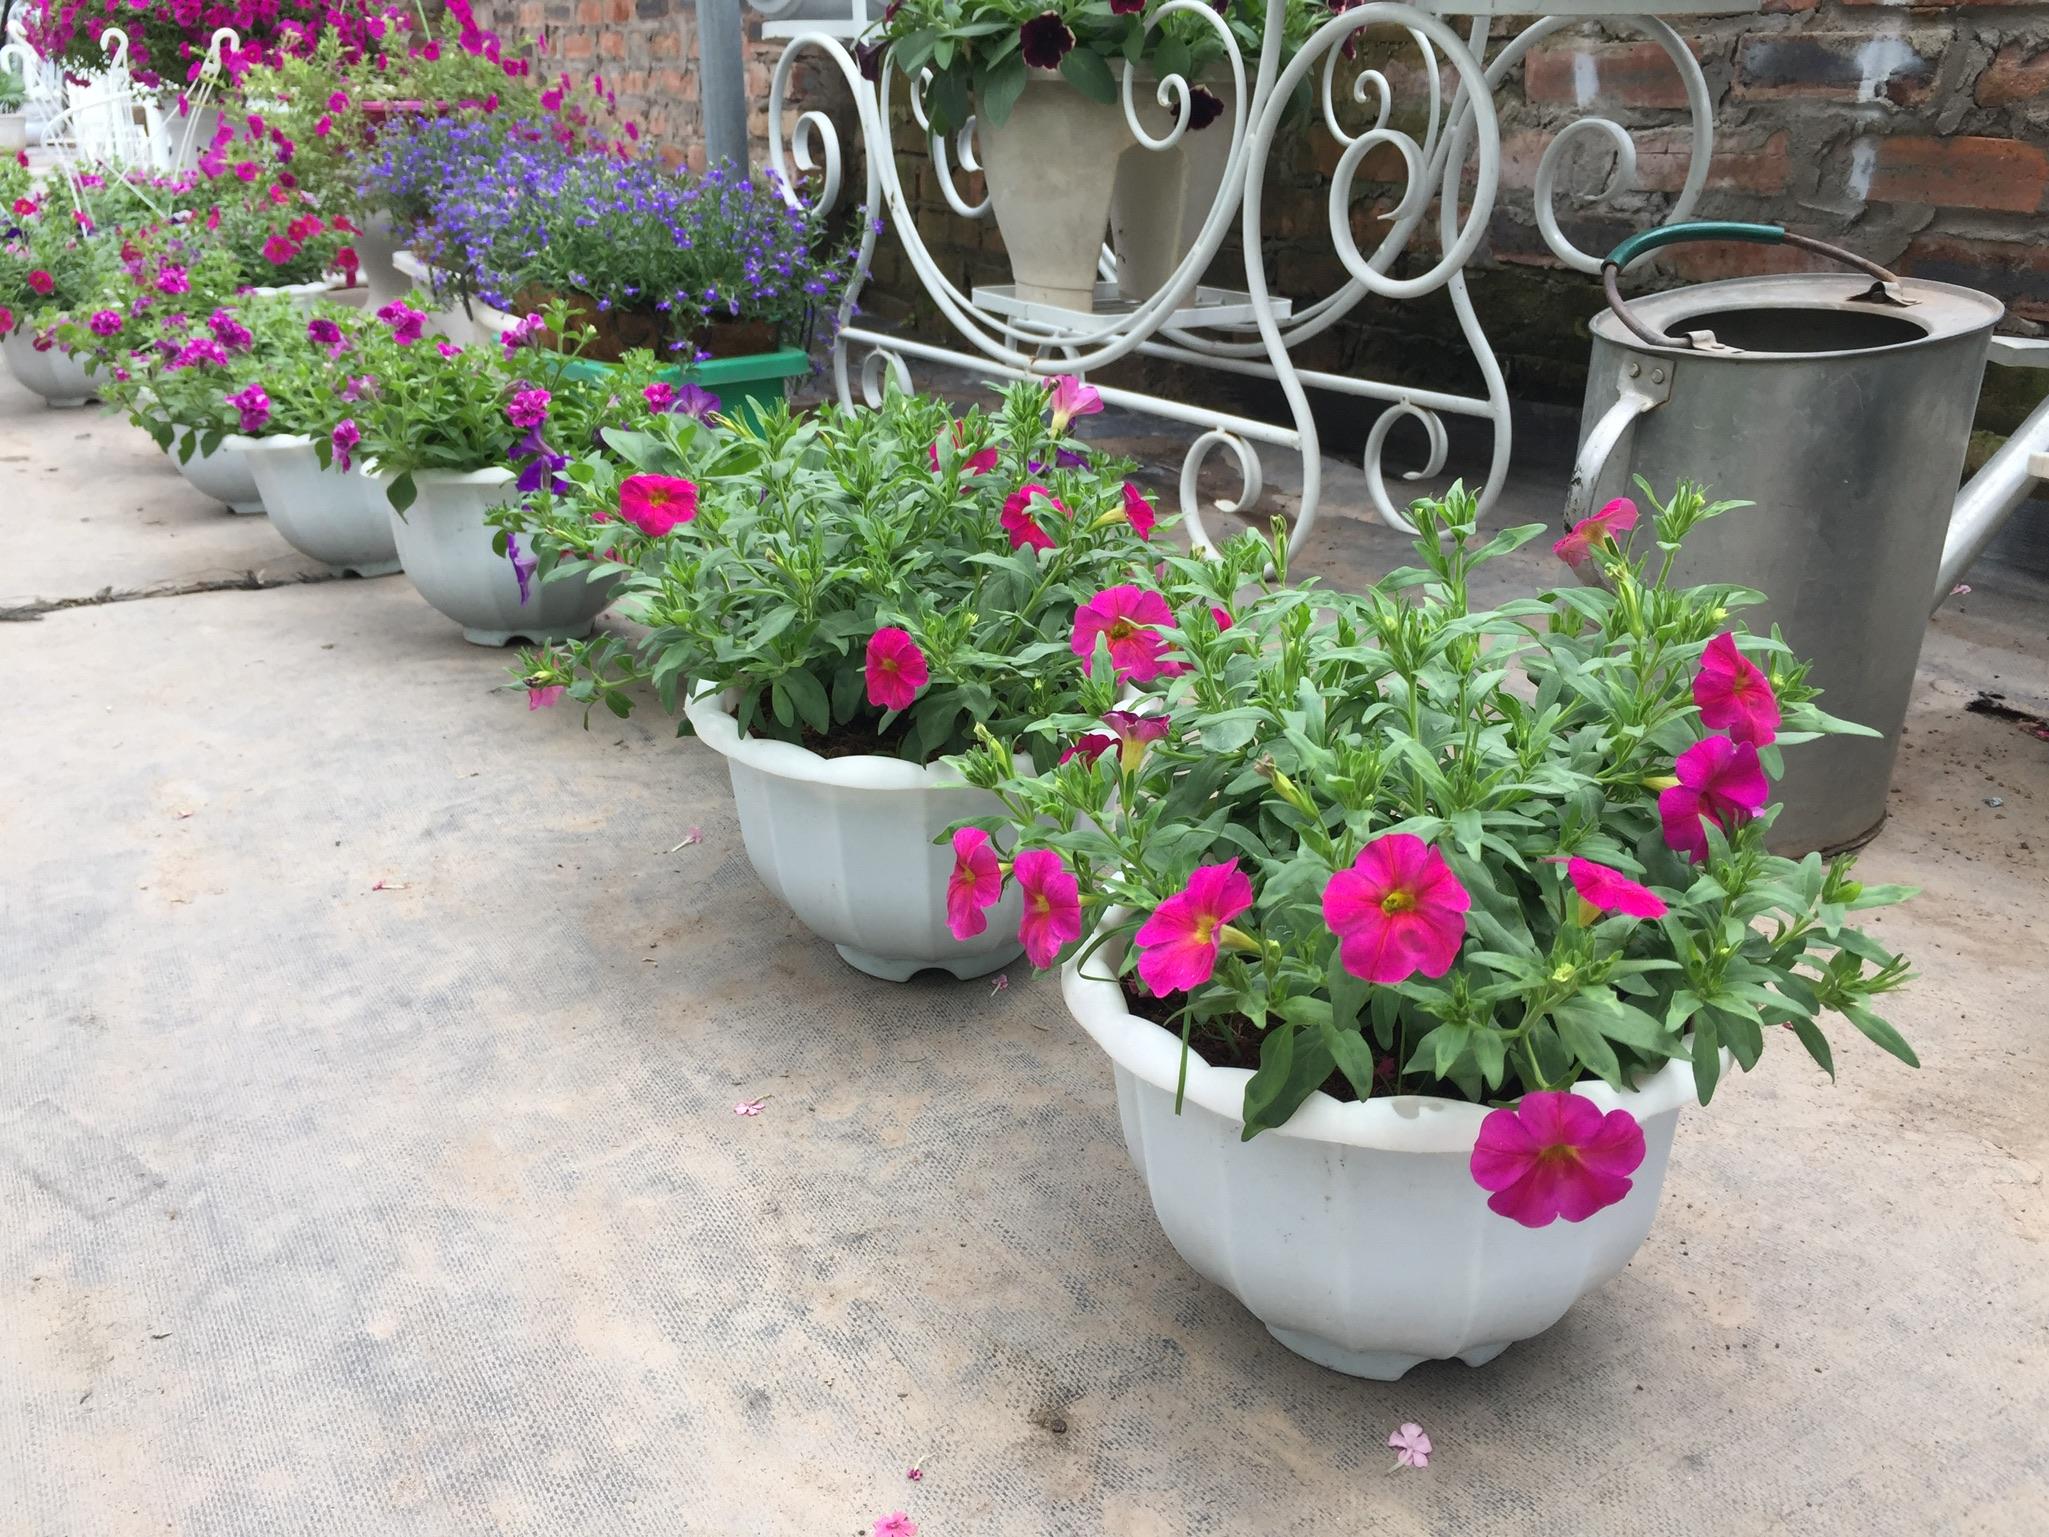 da-yen-thao-1 Kĩ thuật chăm sóc cây hoa dạ yến thảo